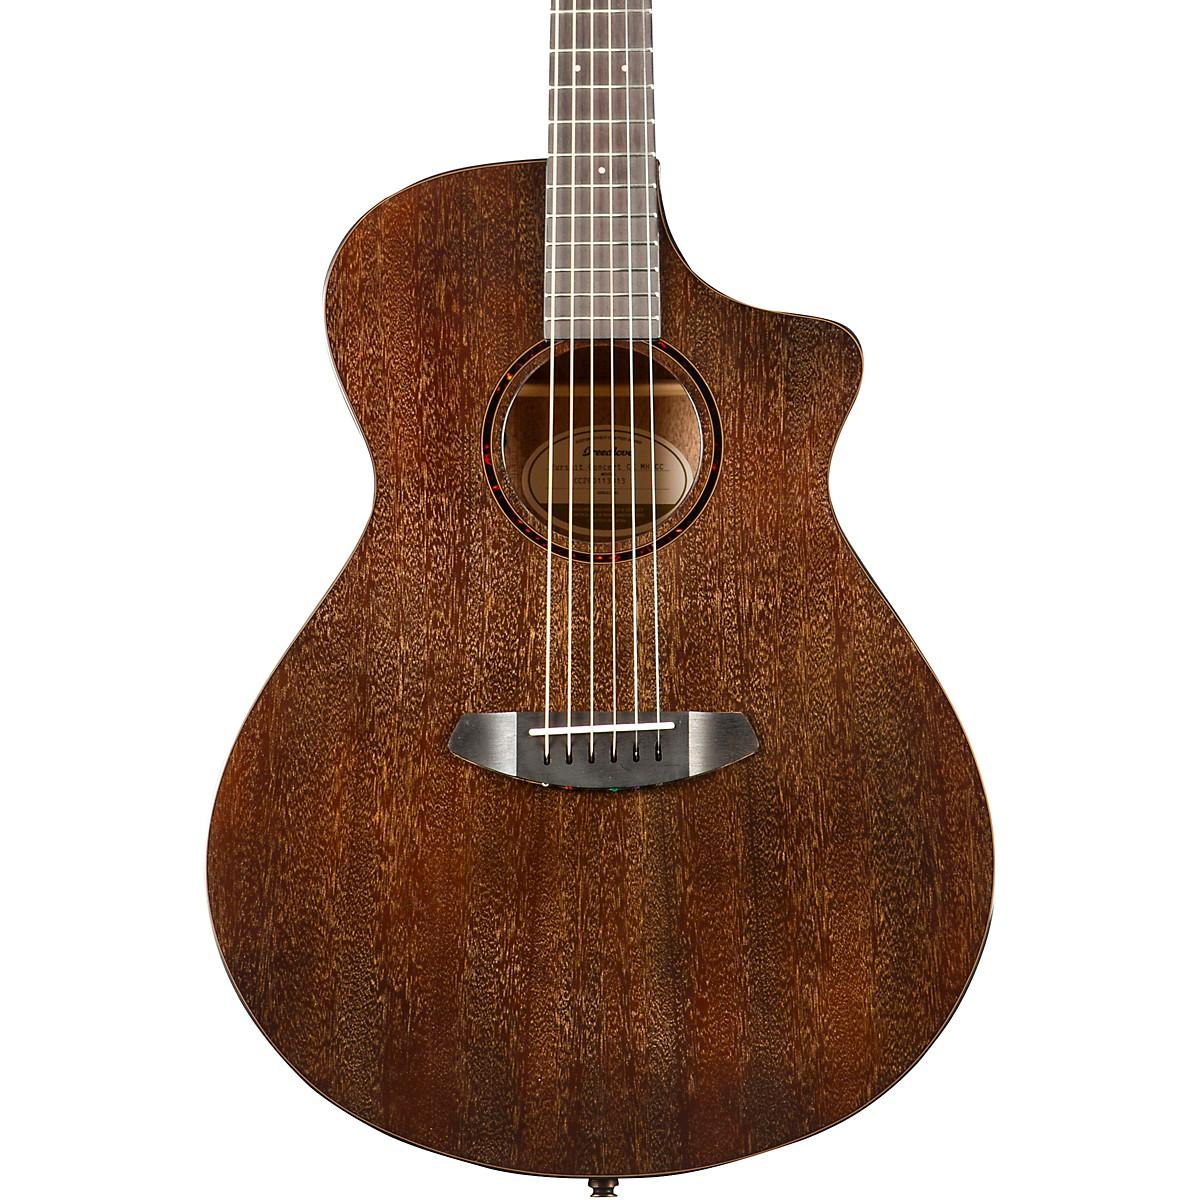 Breedlove Pursuit Exotic Concert Chocolate Box CE Mahogany-Mahogany Acoustic-Electric Guitar